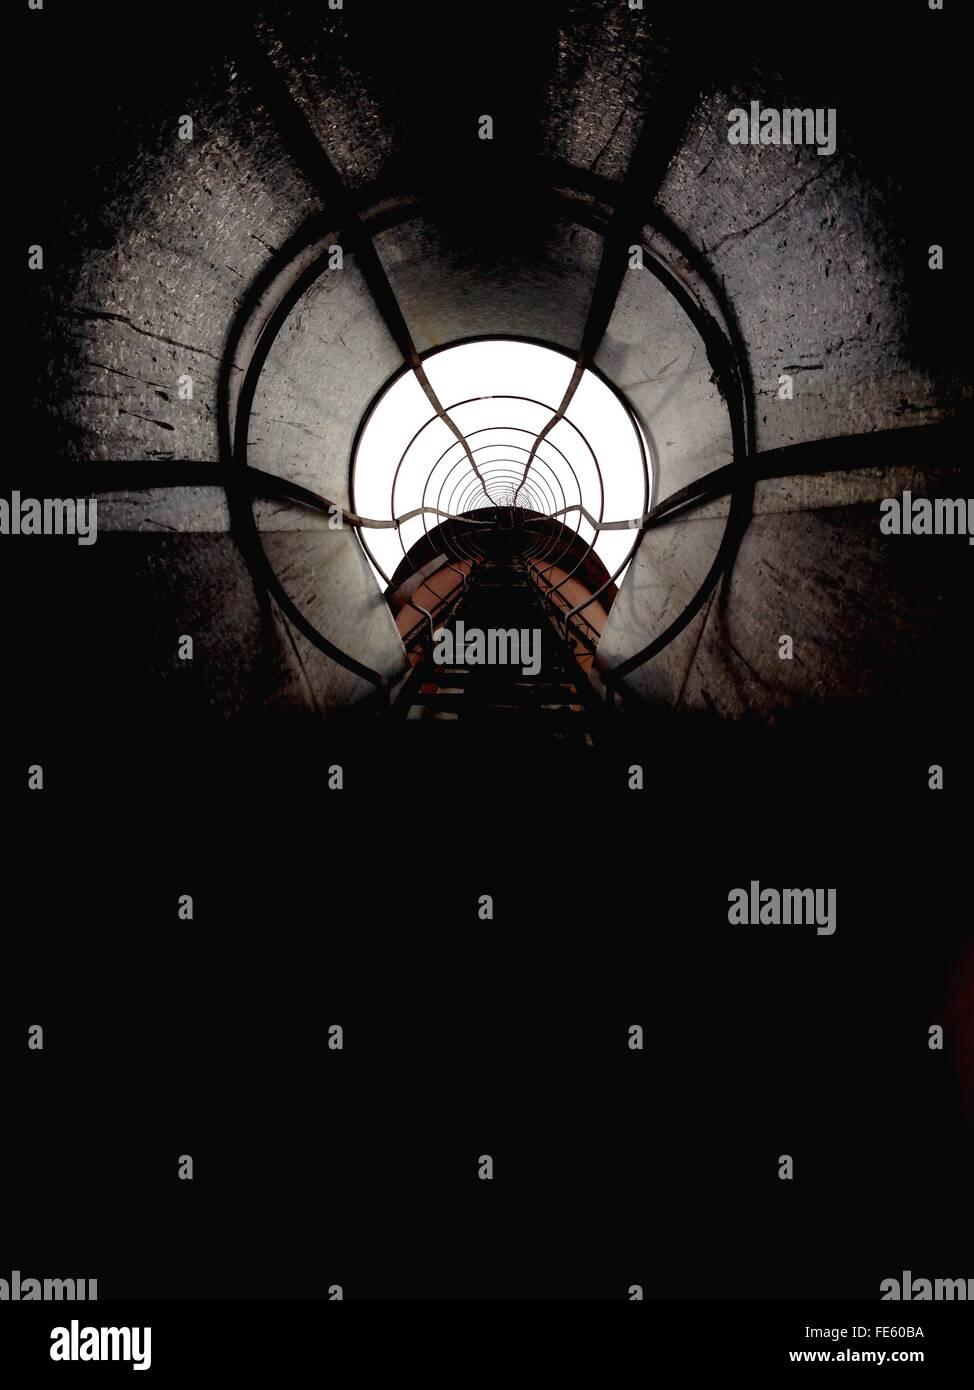 Vía férrea en túnel iluminado Imagen De Stock